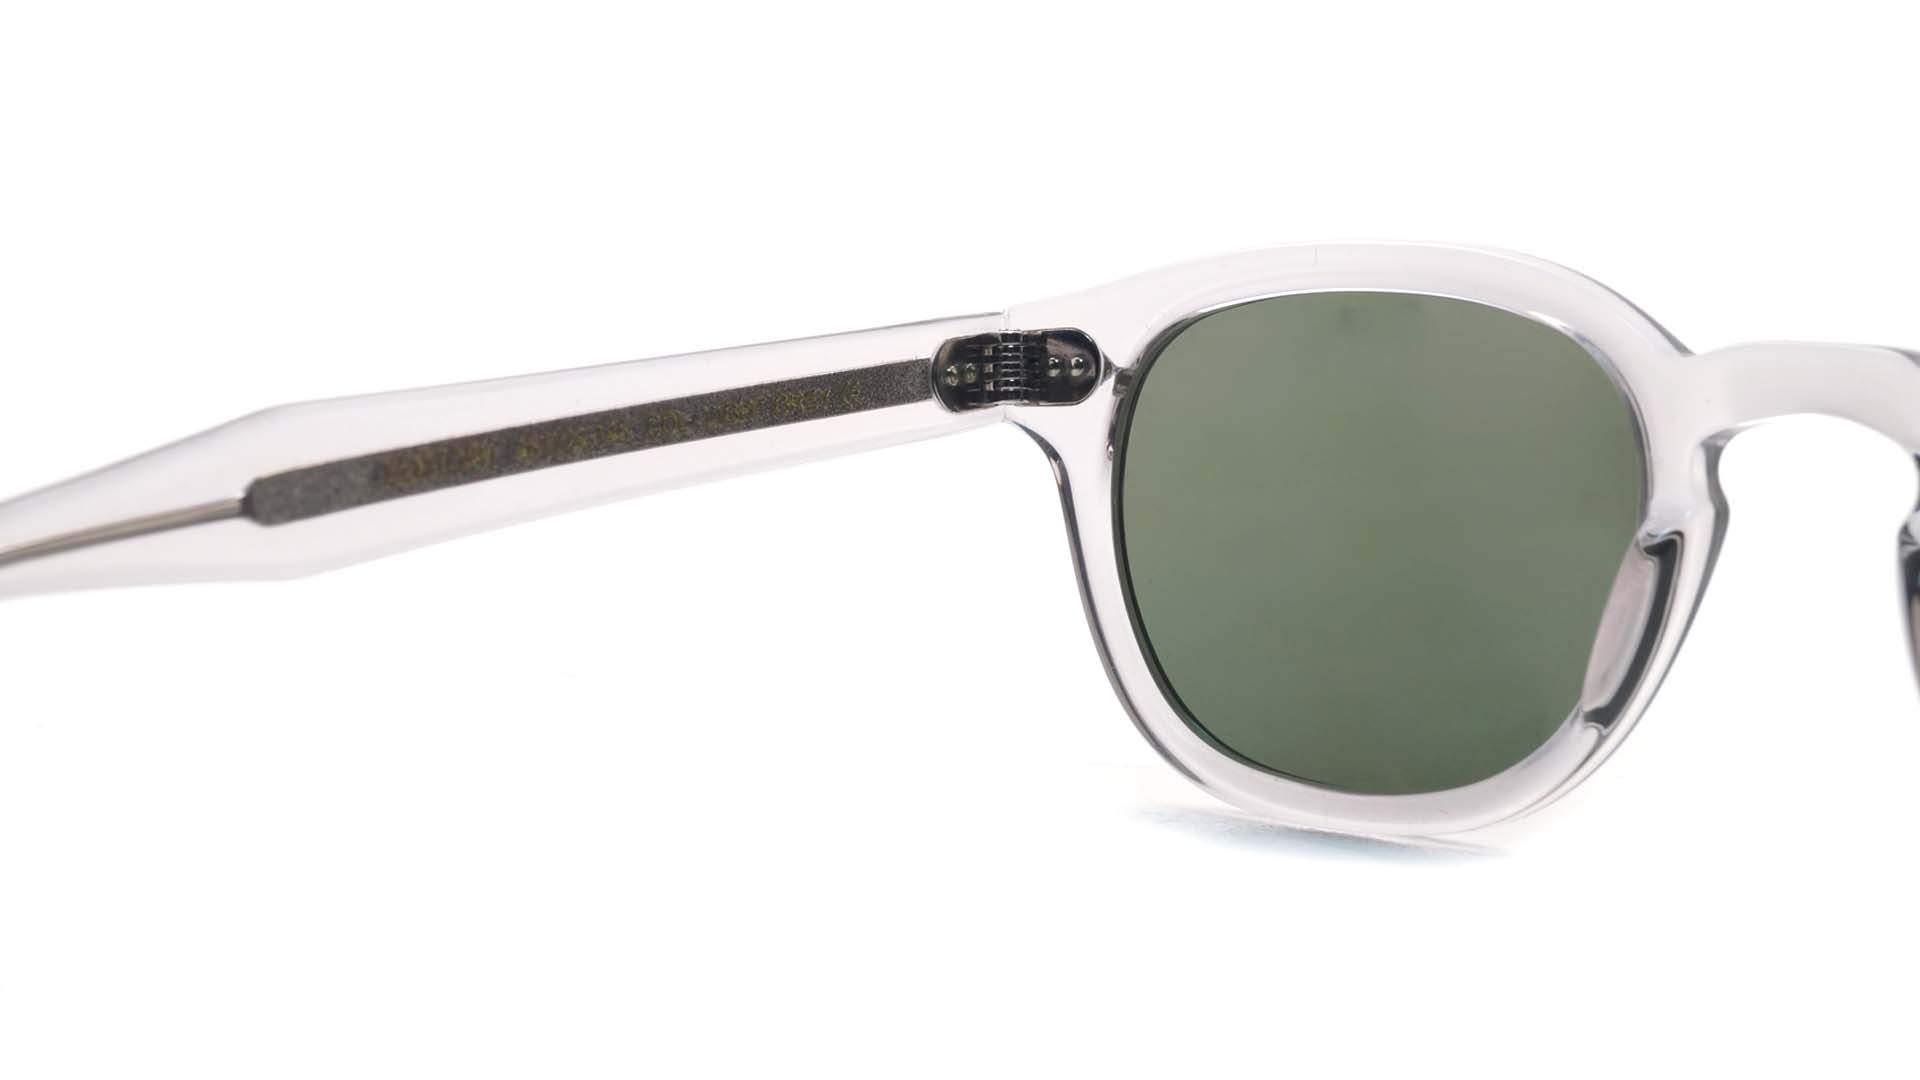 a2117ad568 Sunglasses Moscot Lemtosh Clear LEM 1202-46-AC-SUN-02 46-24 Large